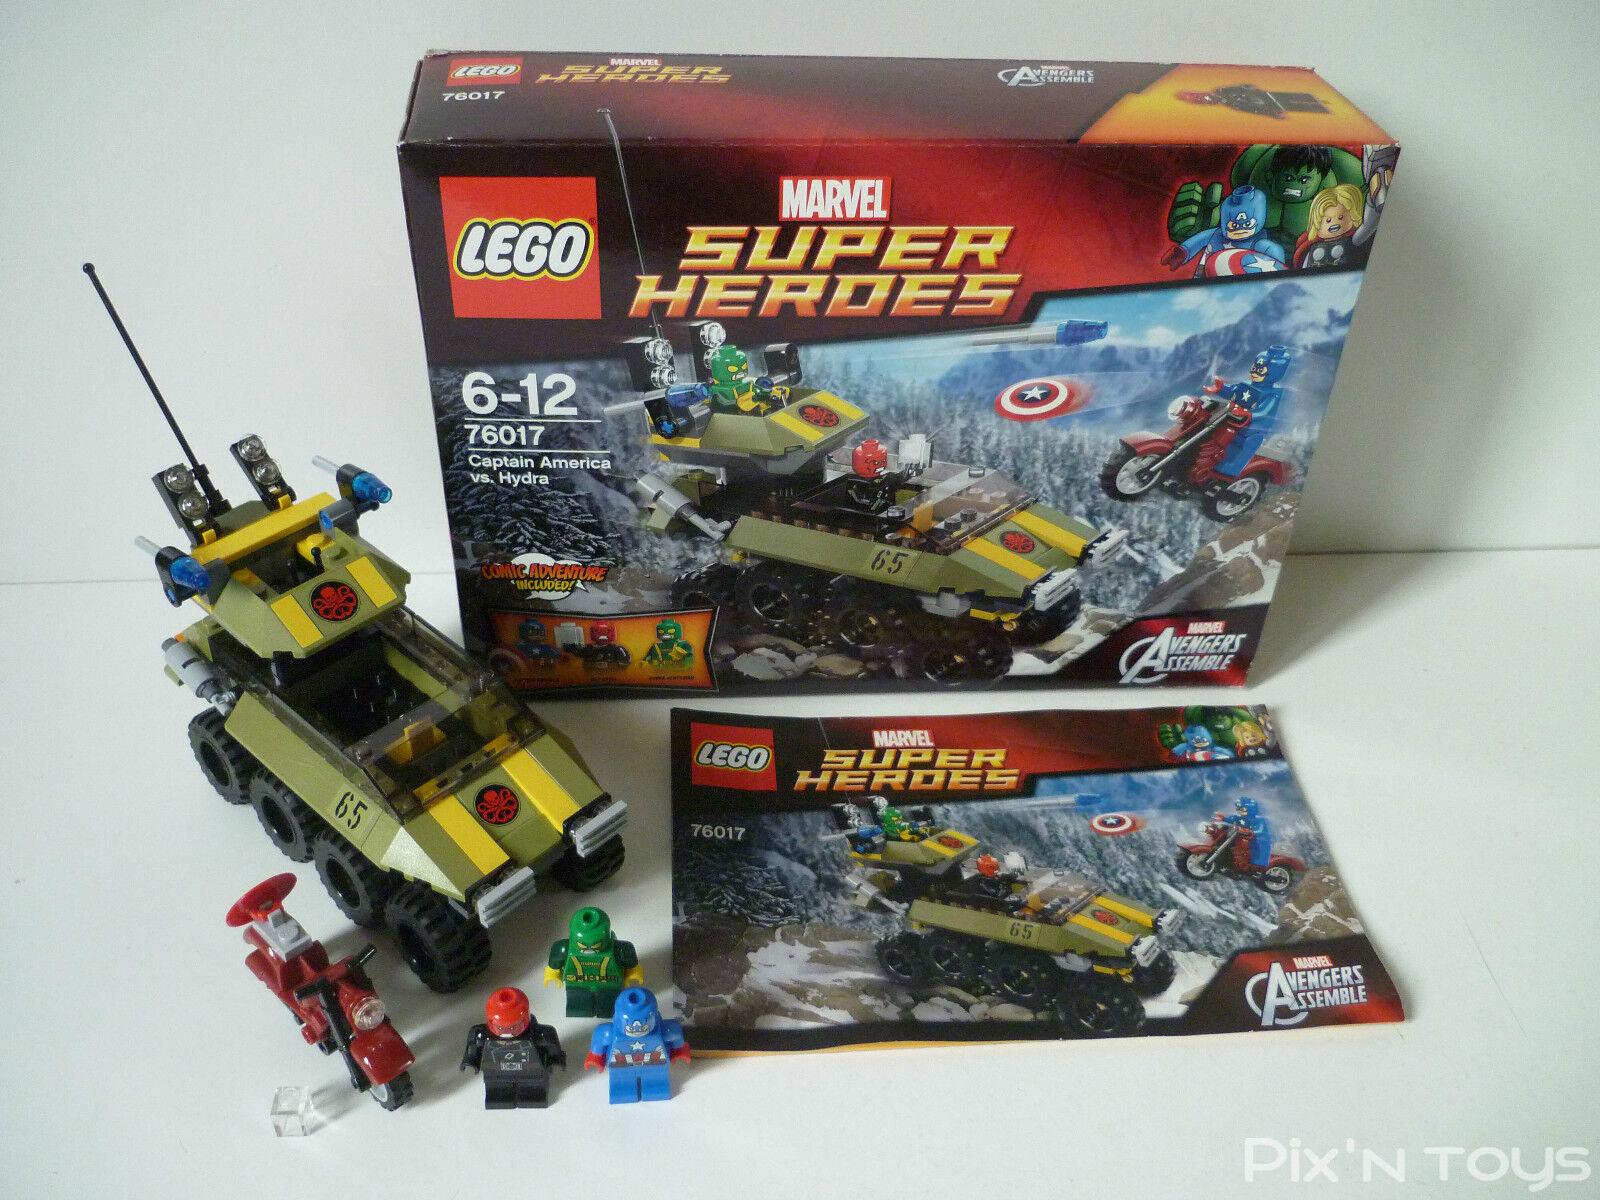 LEGO Super Héros Marvel Avengers Assemble 76017 Captain America vs Hydra